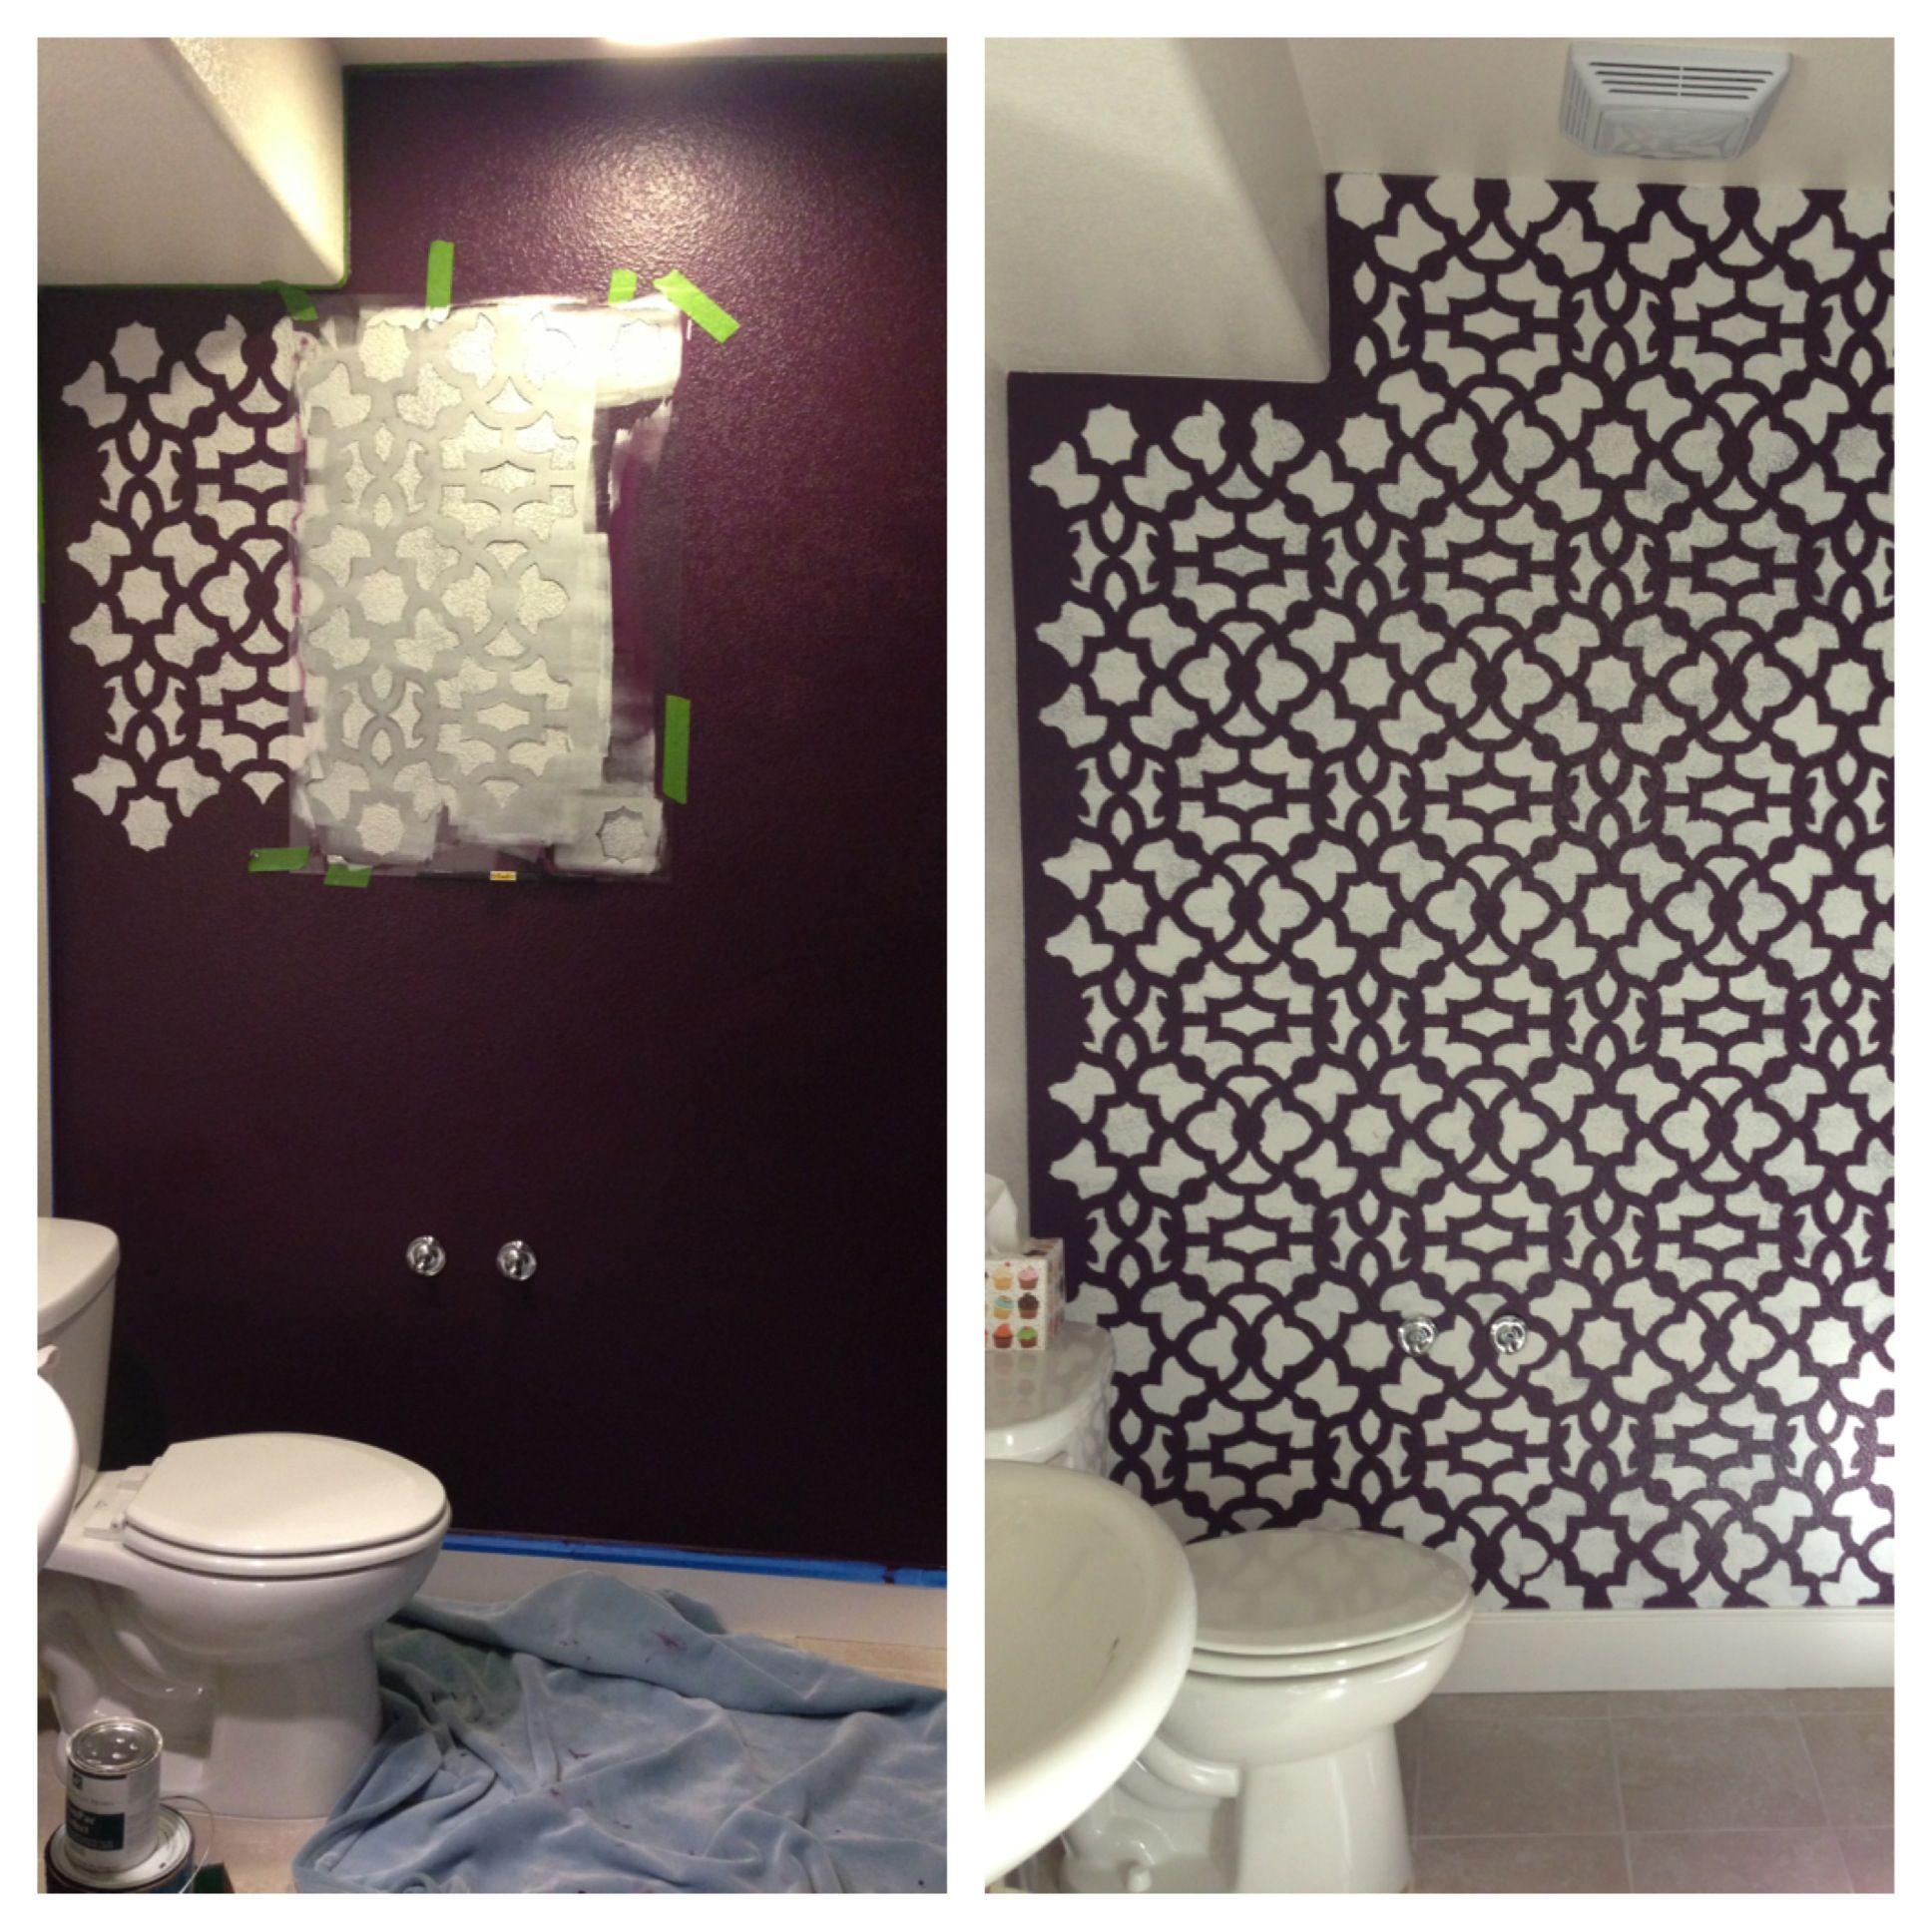 Purple bathroom with stencil design Walls I love